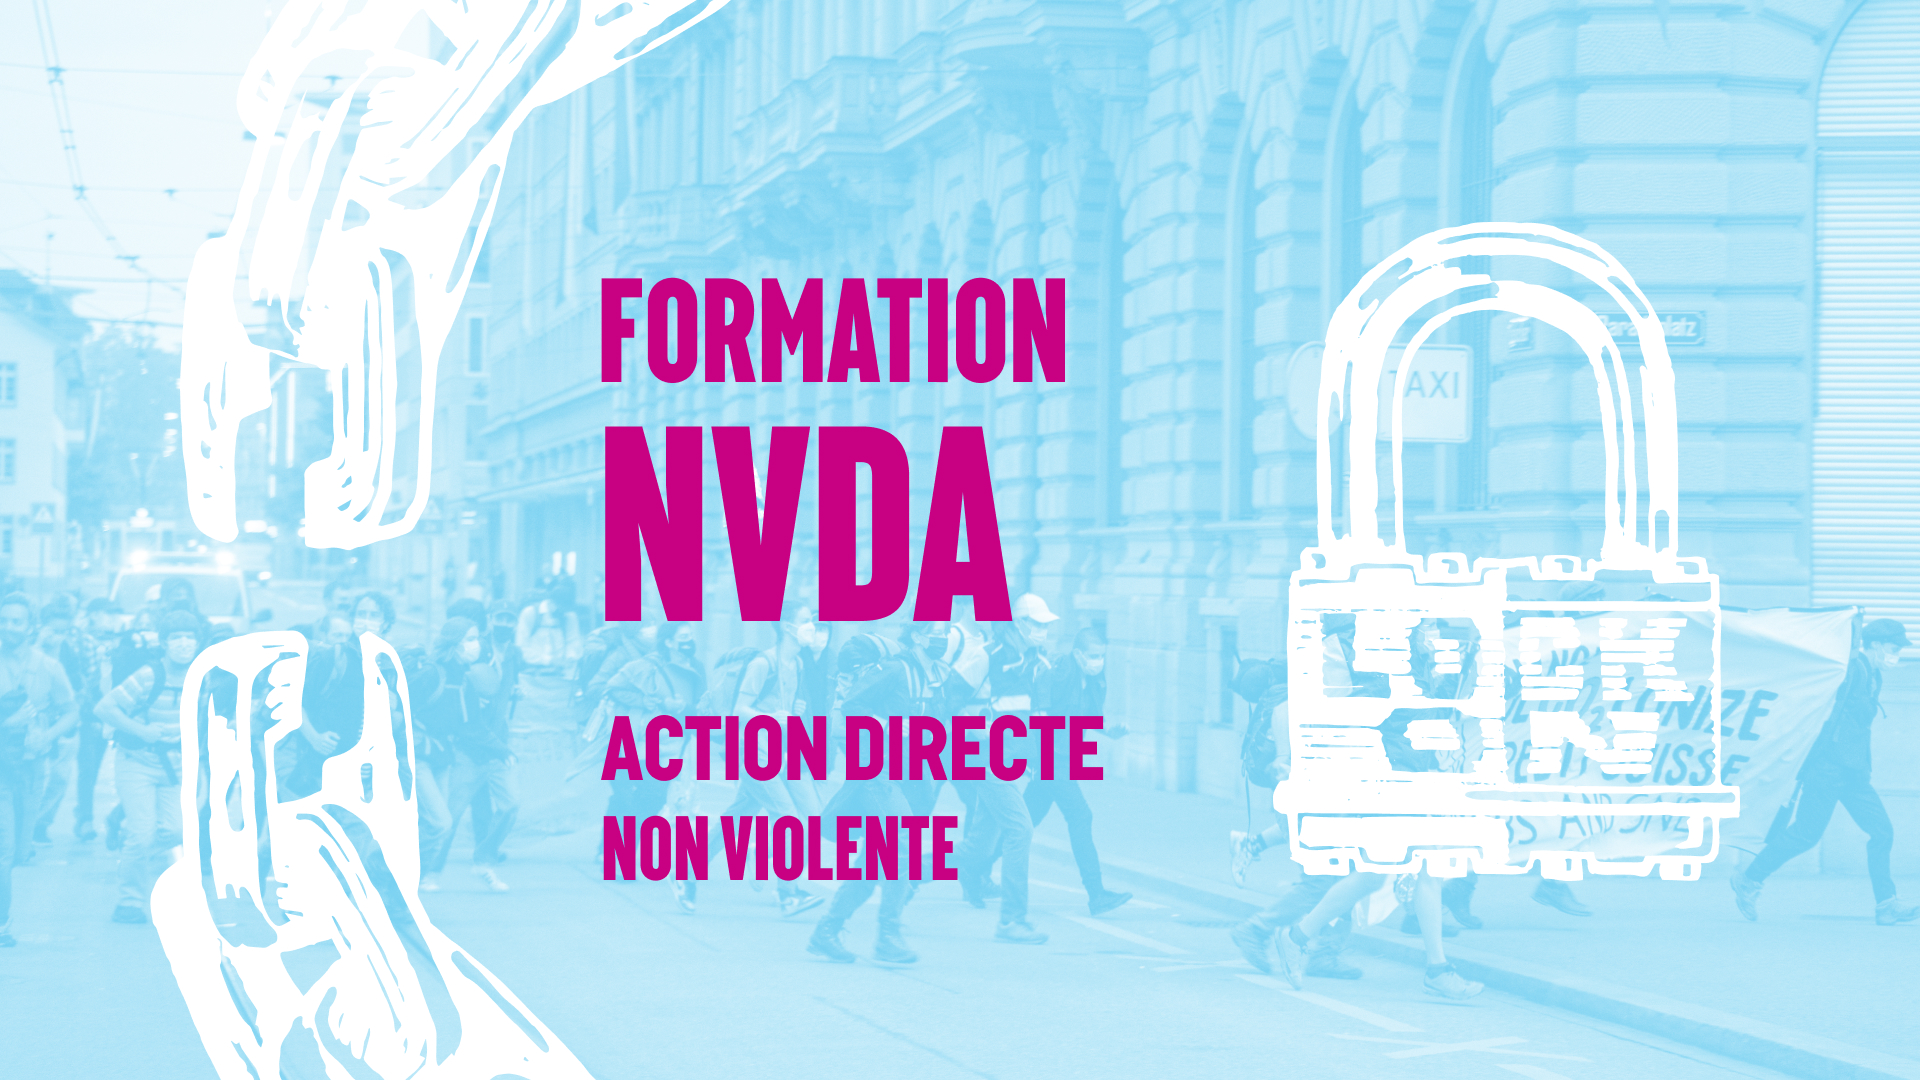 Formation NVDA